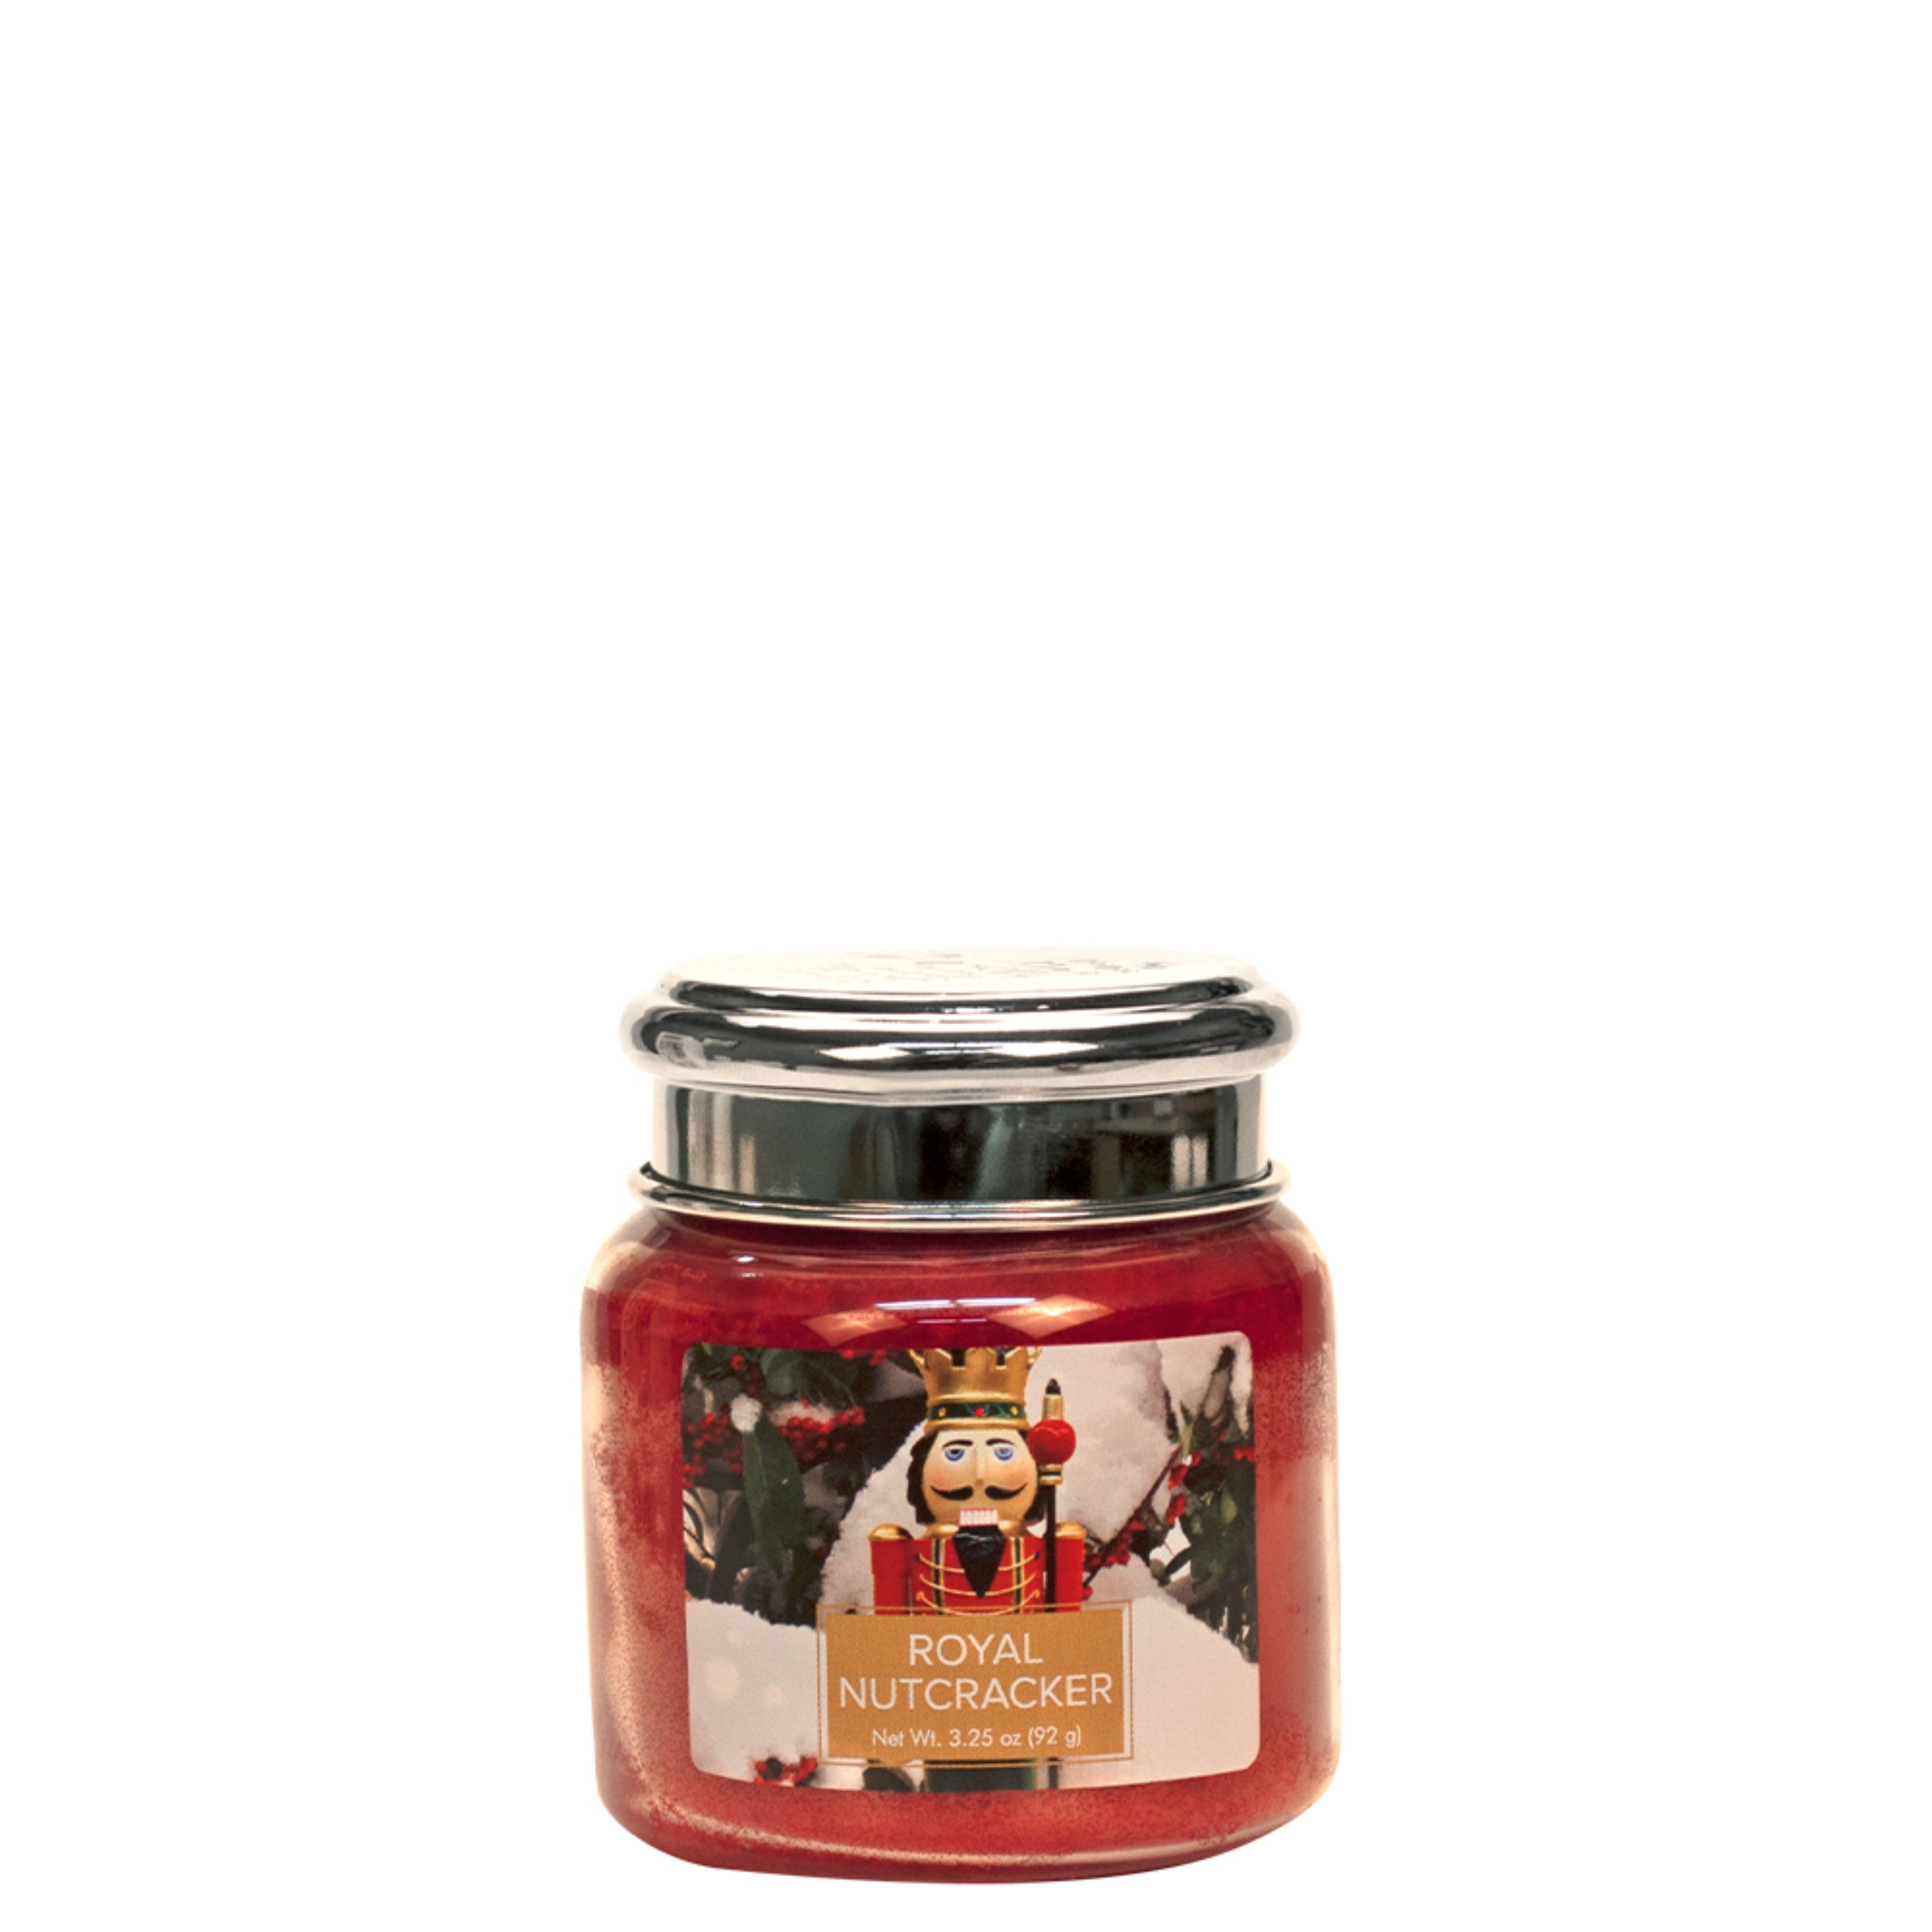 FANTASY Jar Petite 92 g Royal Nutcracker